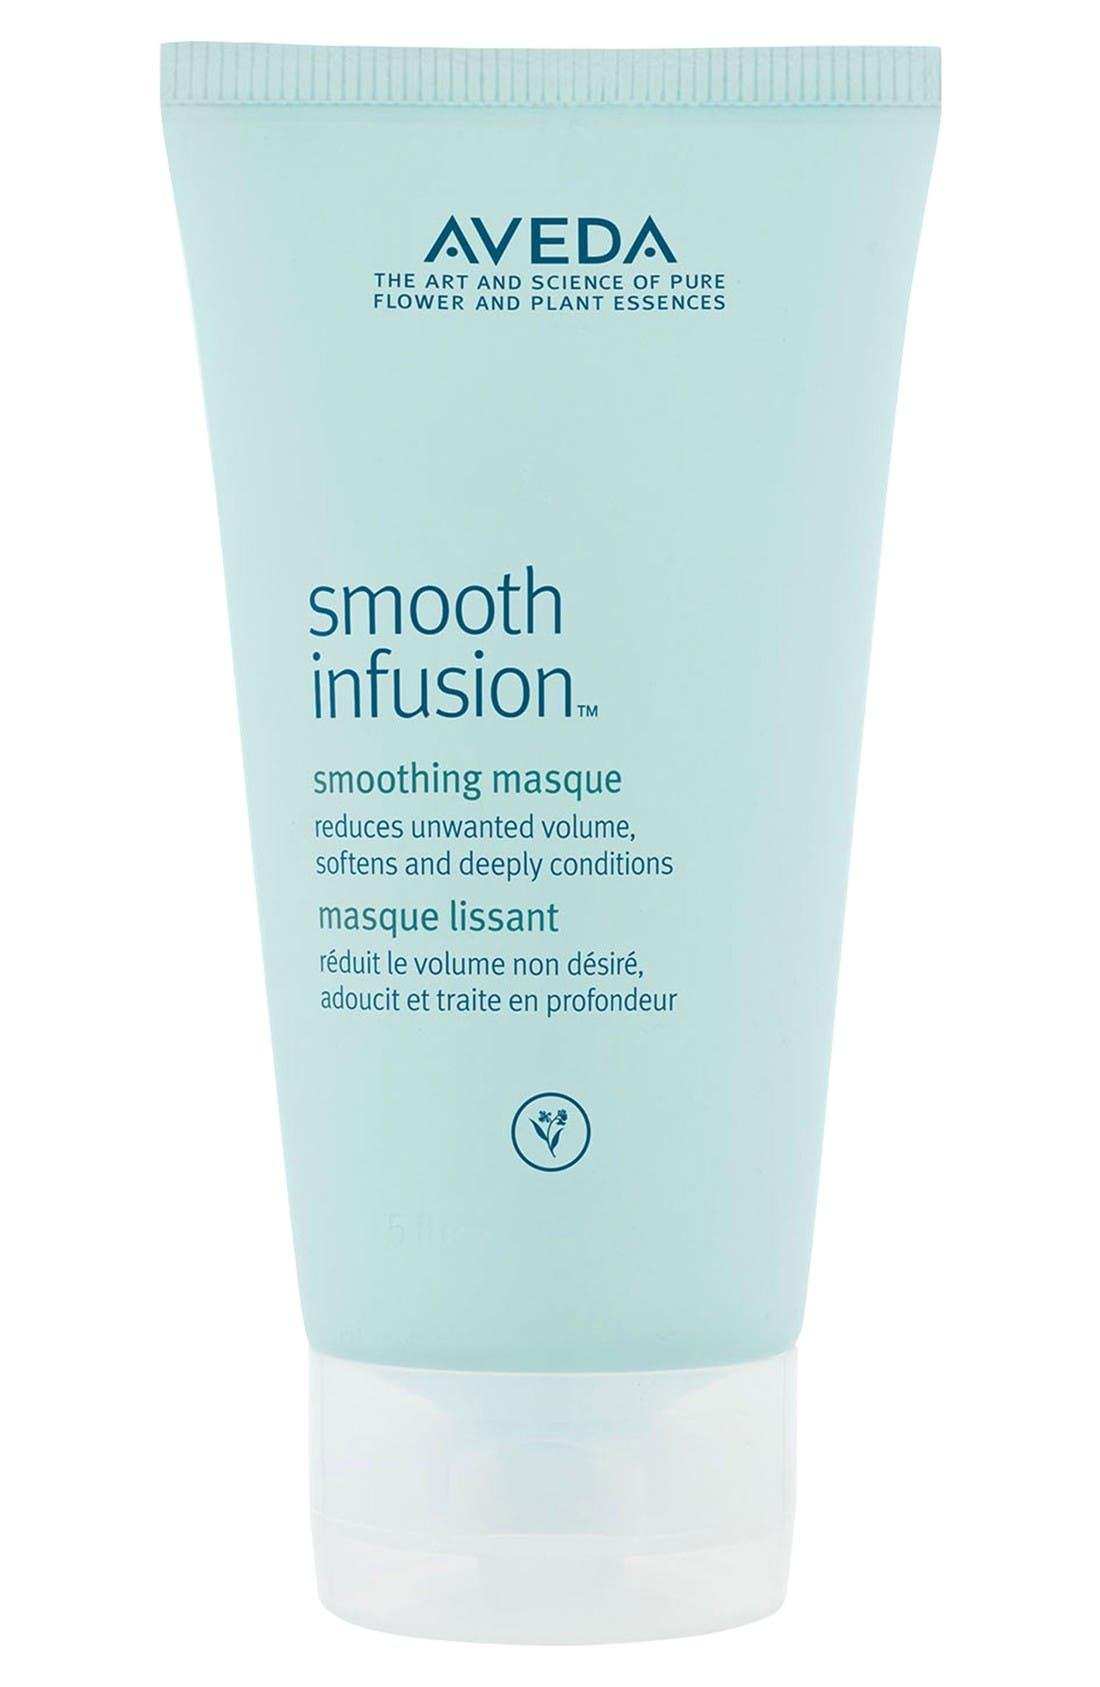 Main Image - Aveda 'smooth infusion™' Smoothing Masque